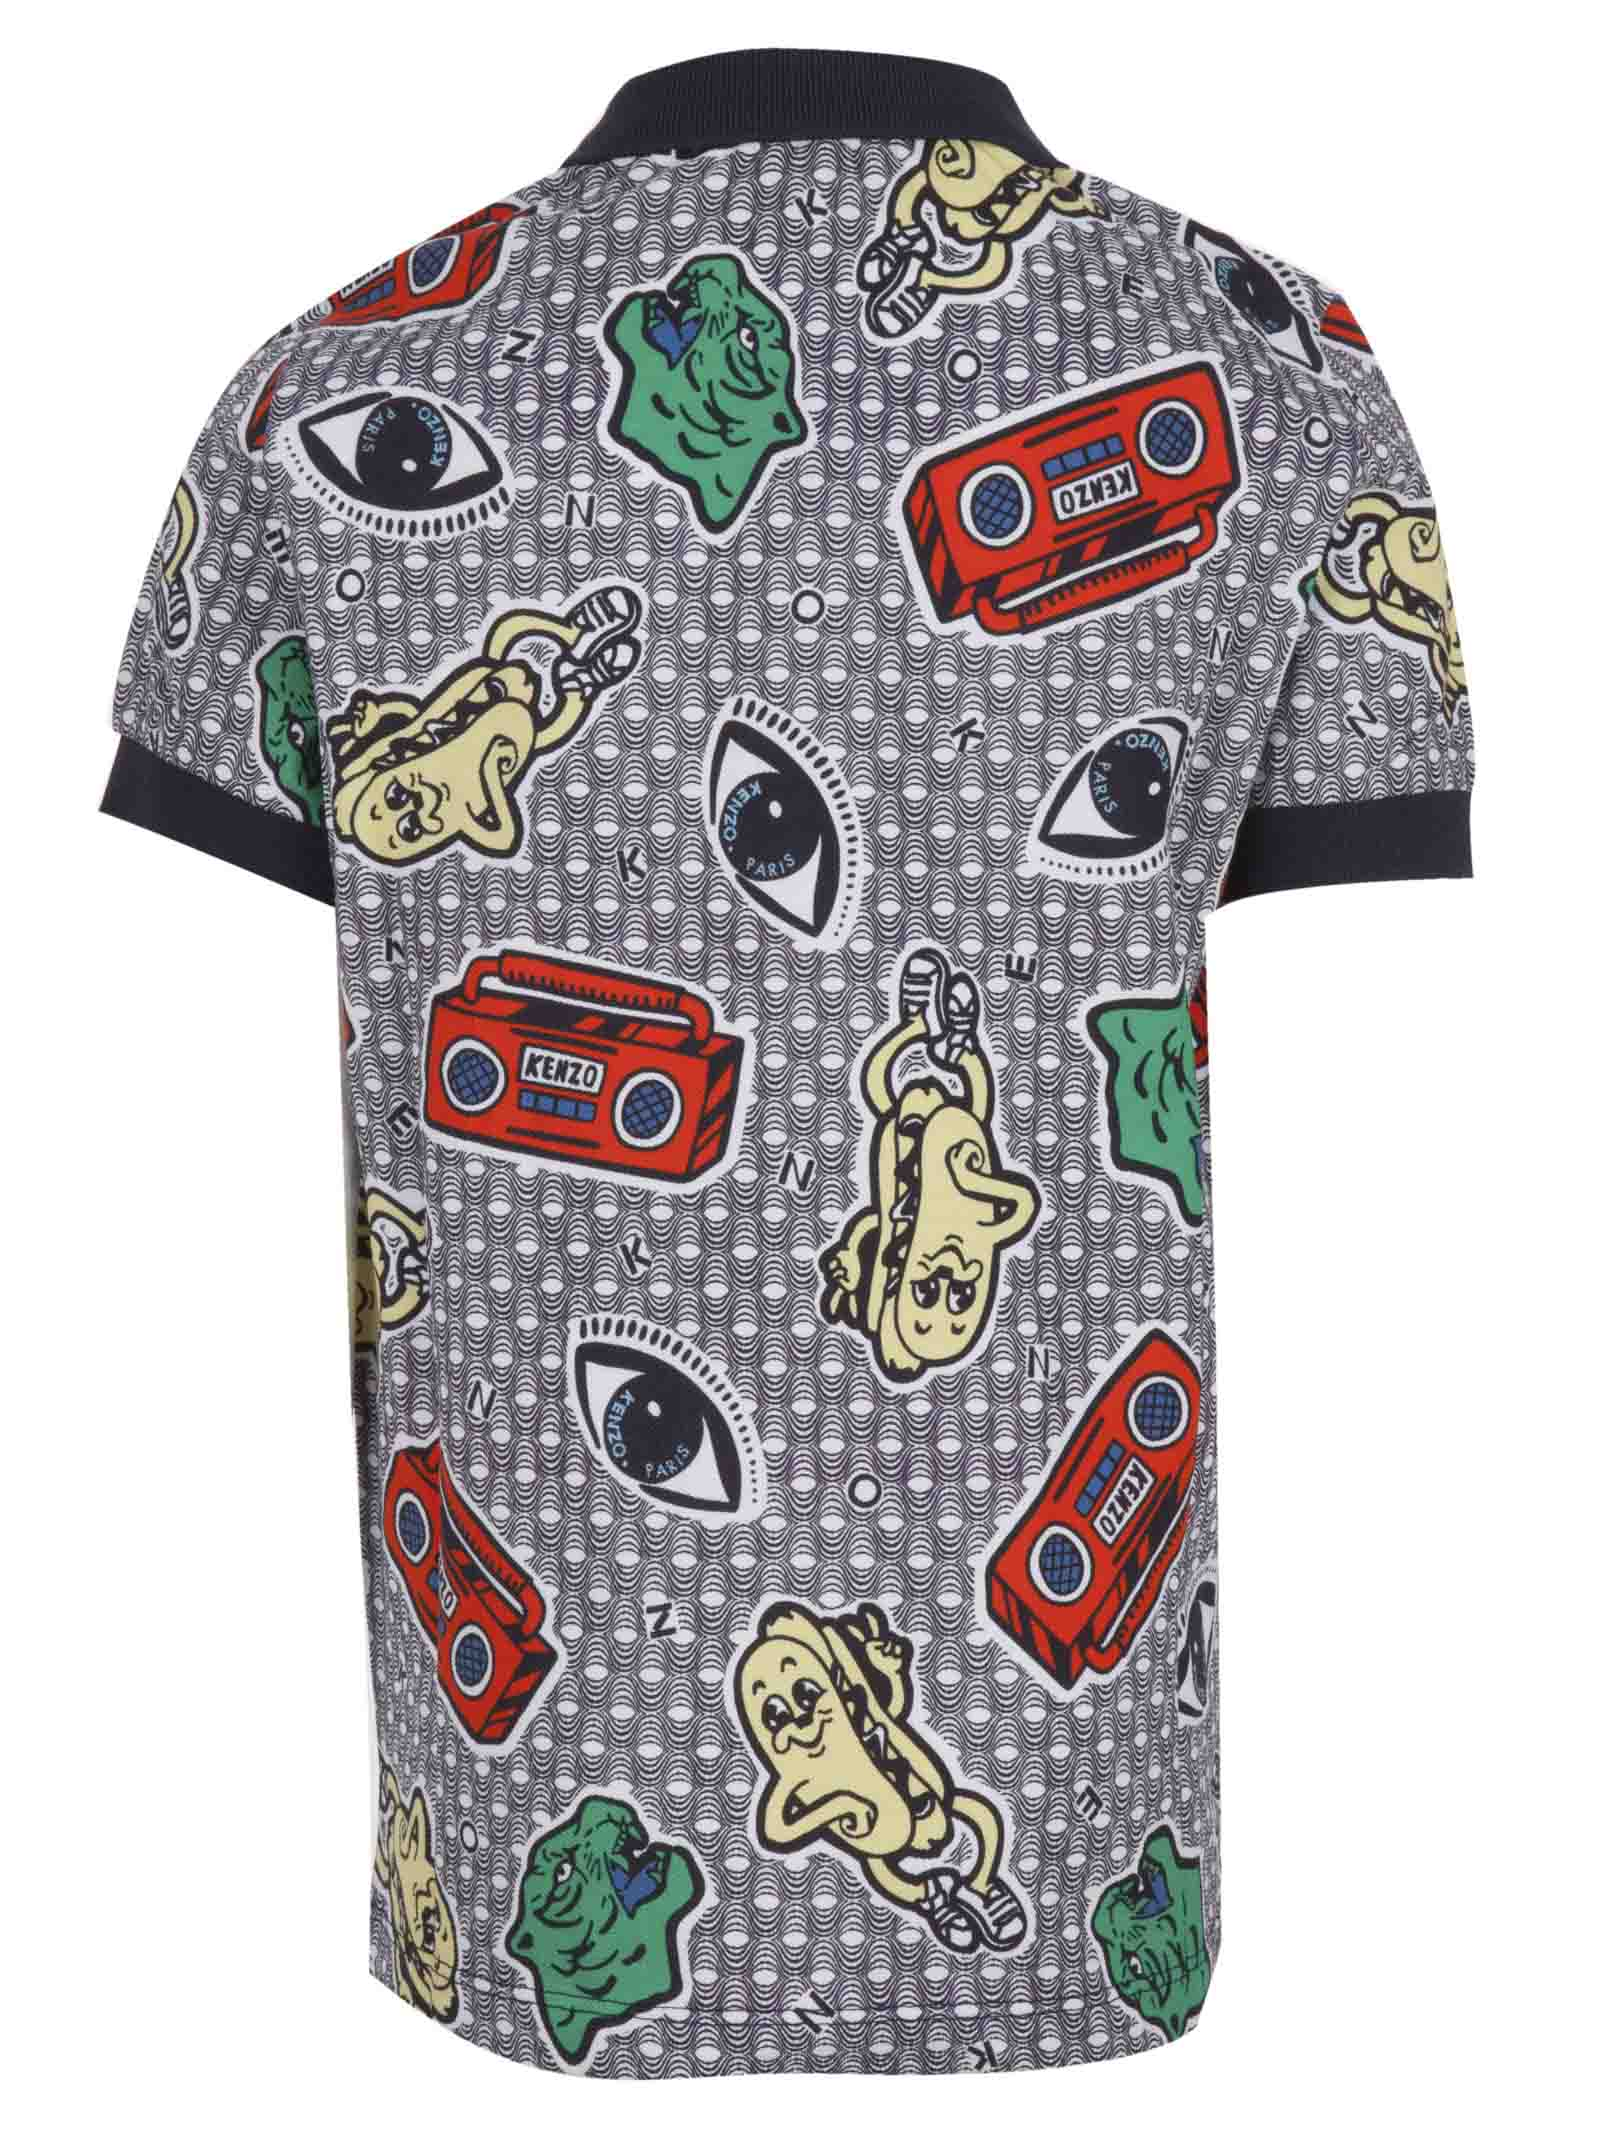 d0556611 Kenzo Polo Shirt - Kenzo Junior - Michele Franzese Moda